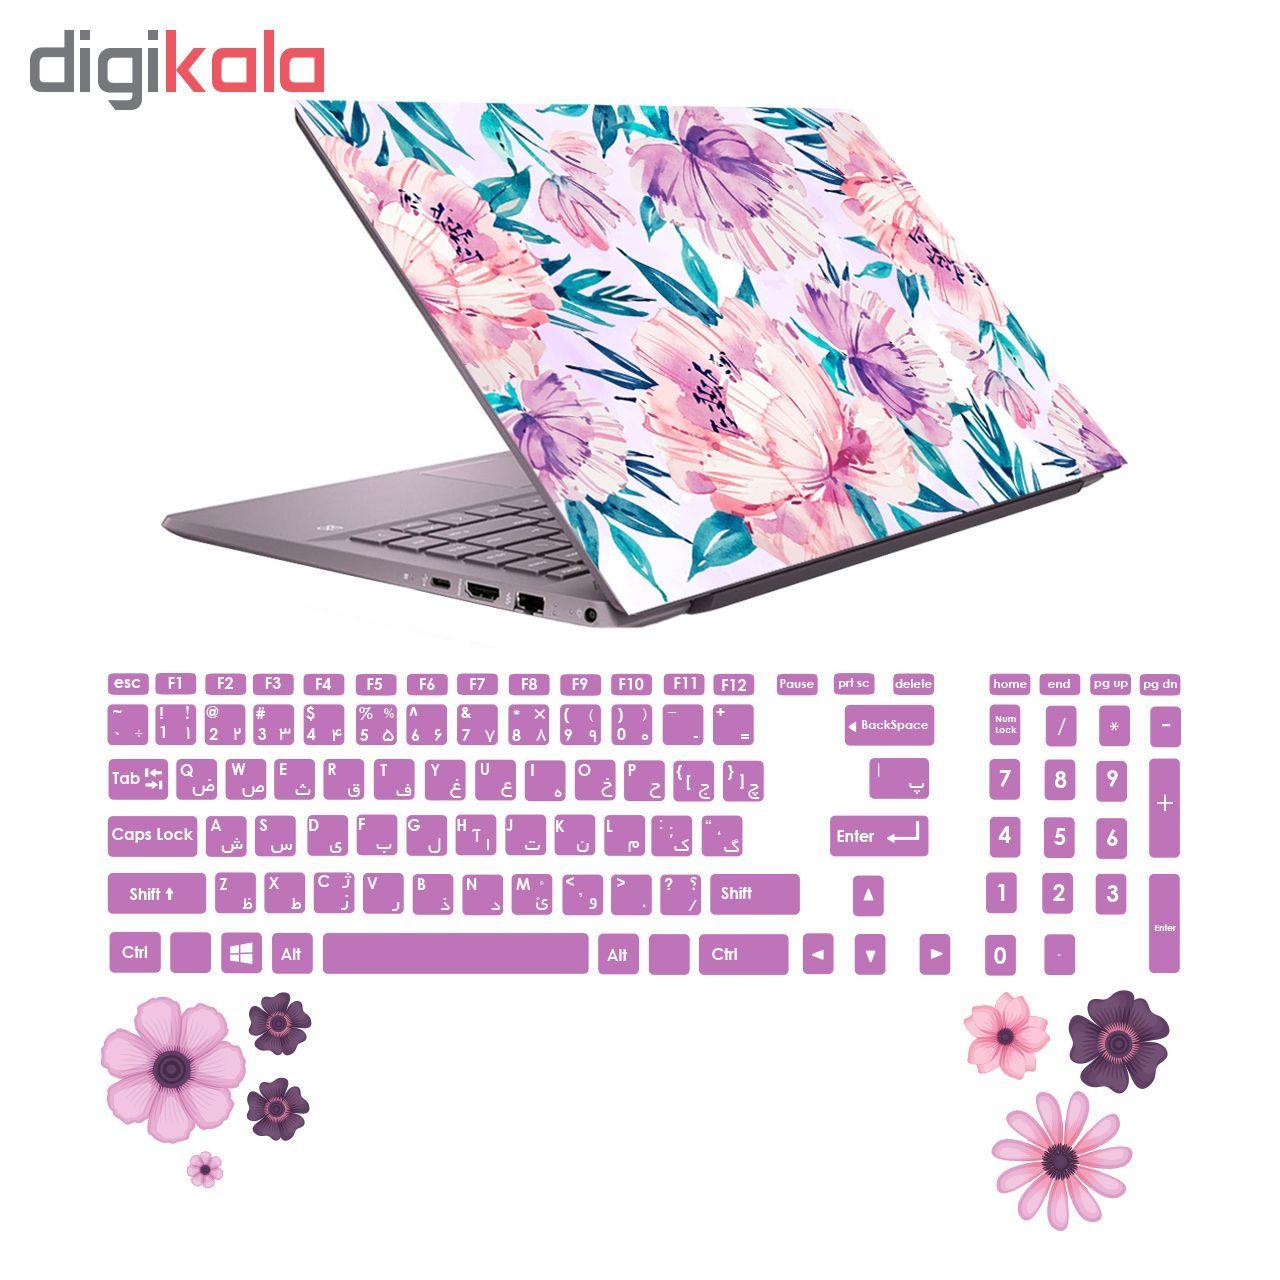 استیکر لپ تاپ صالسو آرت مدل 5002 hk به همراه برچسب حروف فارسی کیبورد main 1 5